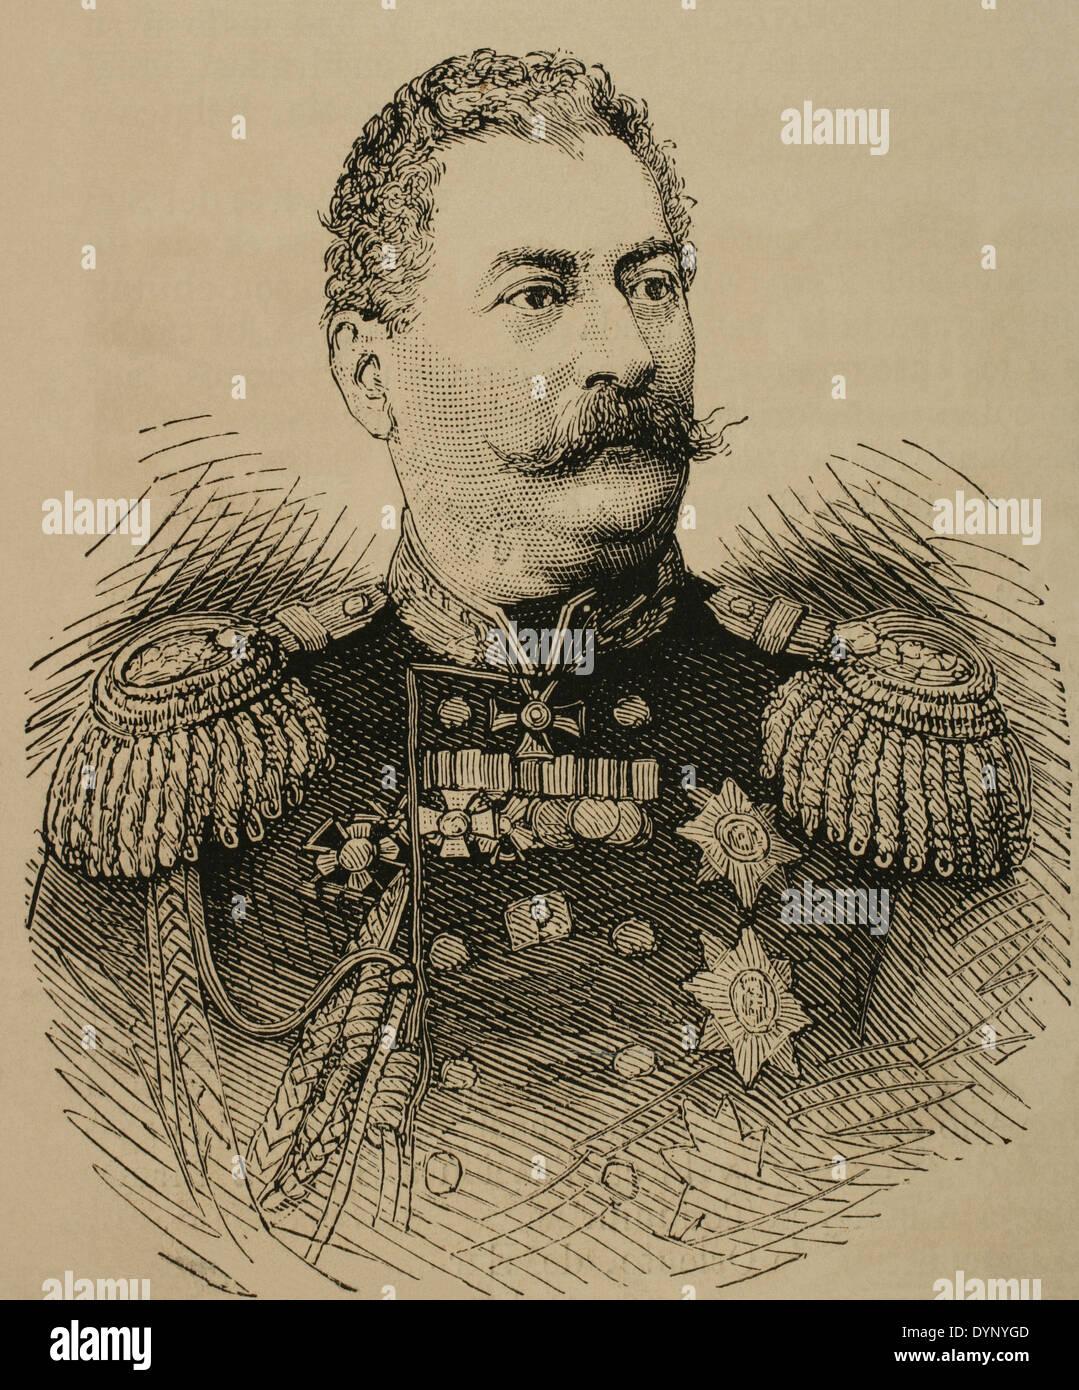 Mikhail Loris-Melikov (1826-1888). Russian-Armenian statesman. Engraving. The Spanish and American Illustration, 1877. - Stock Image